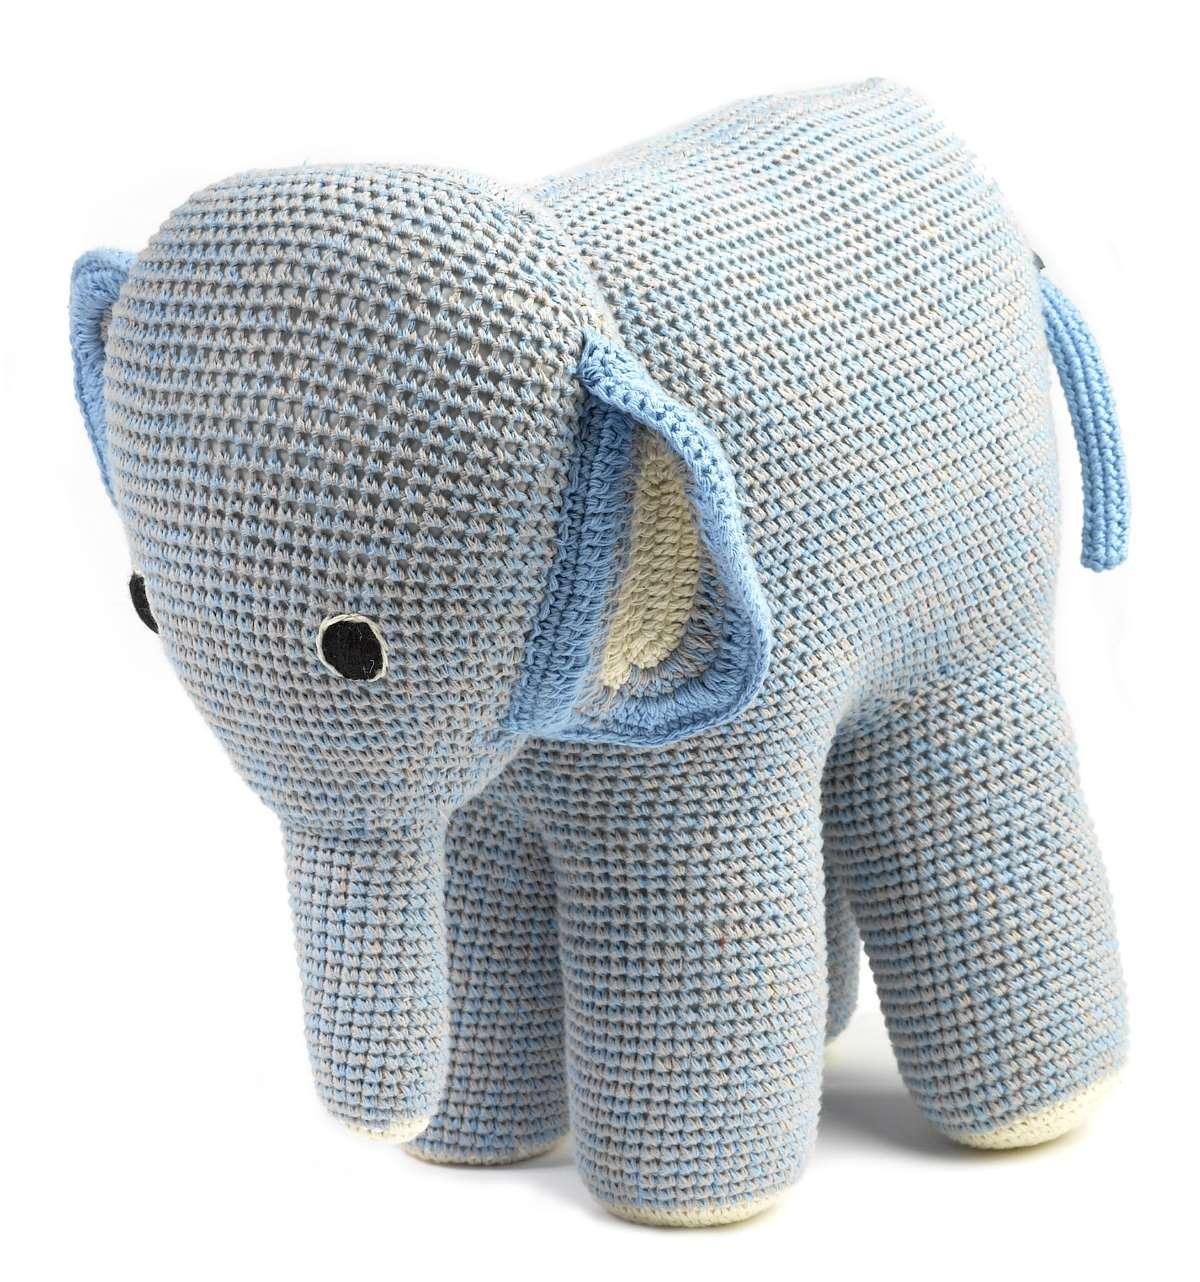 Mama Elephant 29 x 35 cm Plüschtier gehäkelt Anne-Claire Petit - EINZELSTÜCKE